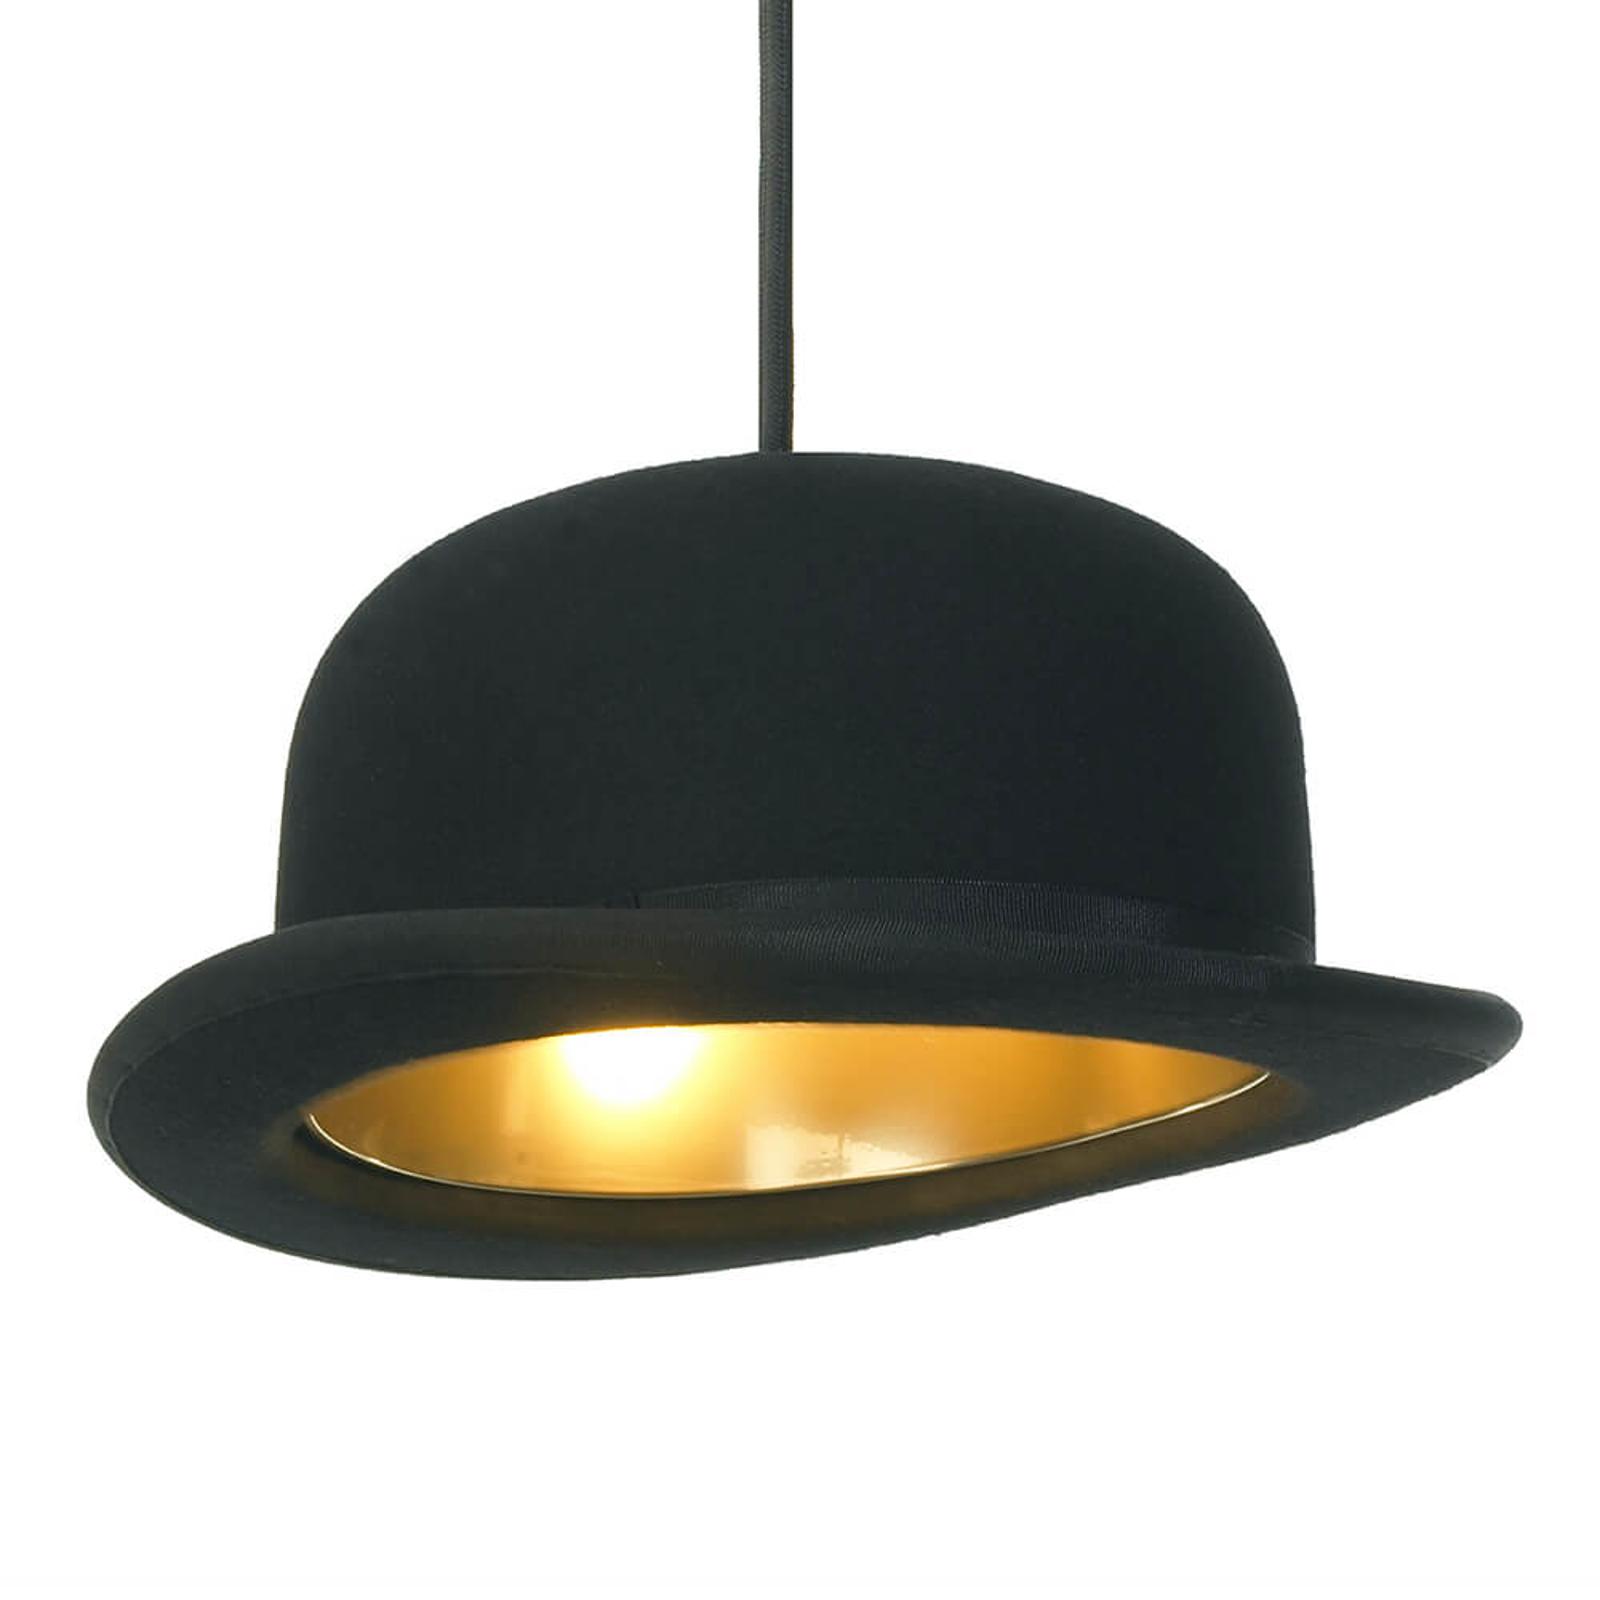 Innermost Jeeves - design-hengelampe i hatteform